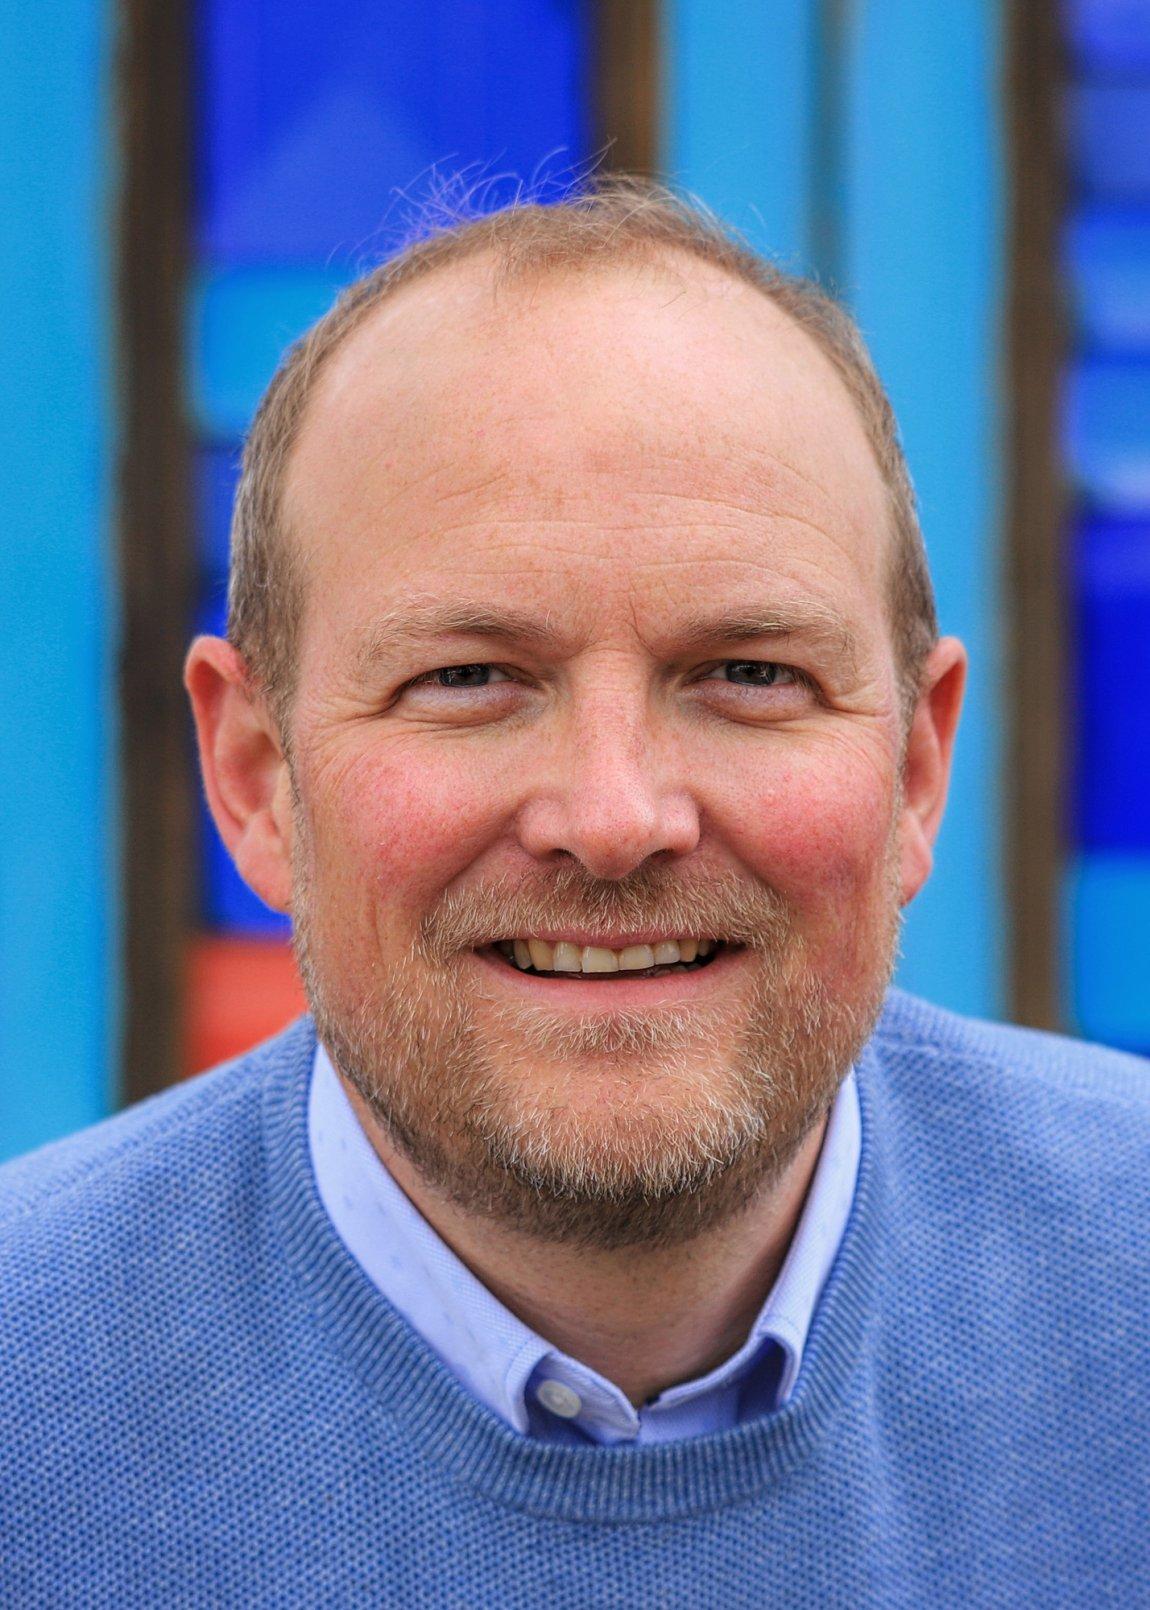 2021 Stortingsrepresentant Ole André Myhrvold (Østfold) portrett